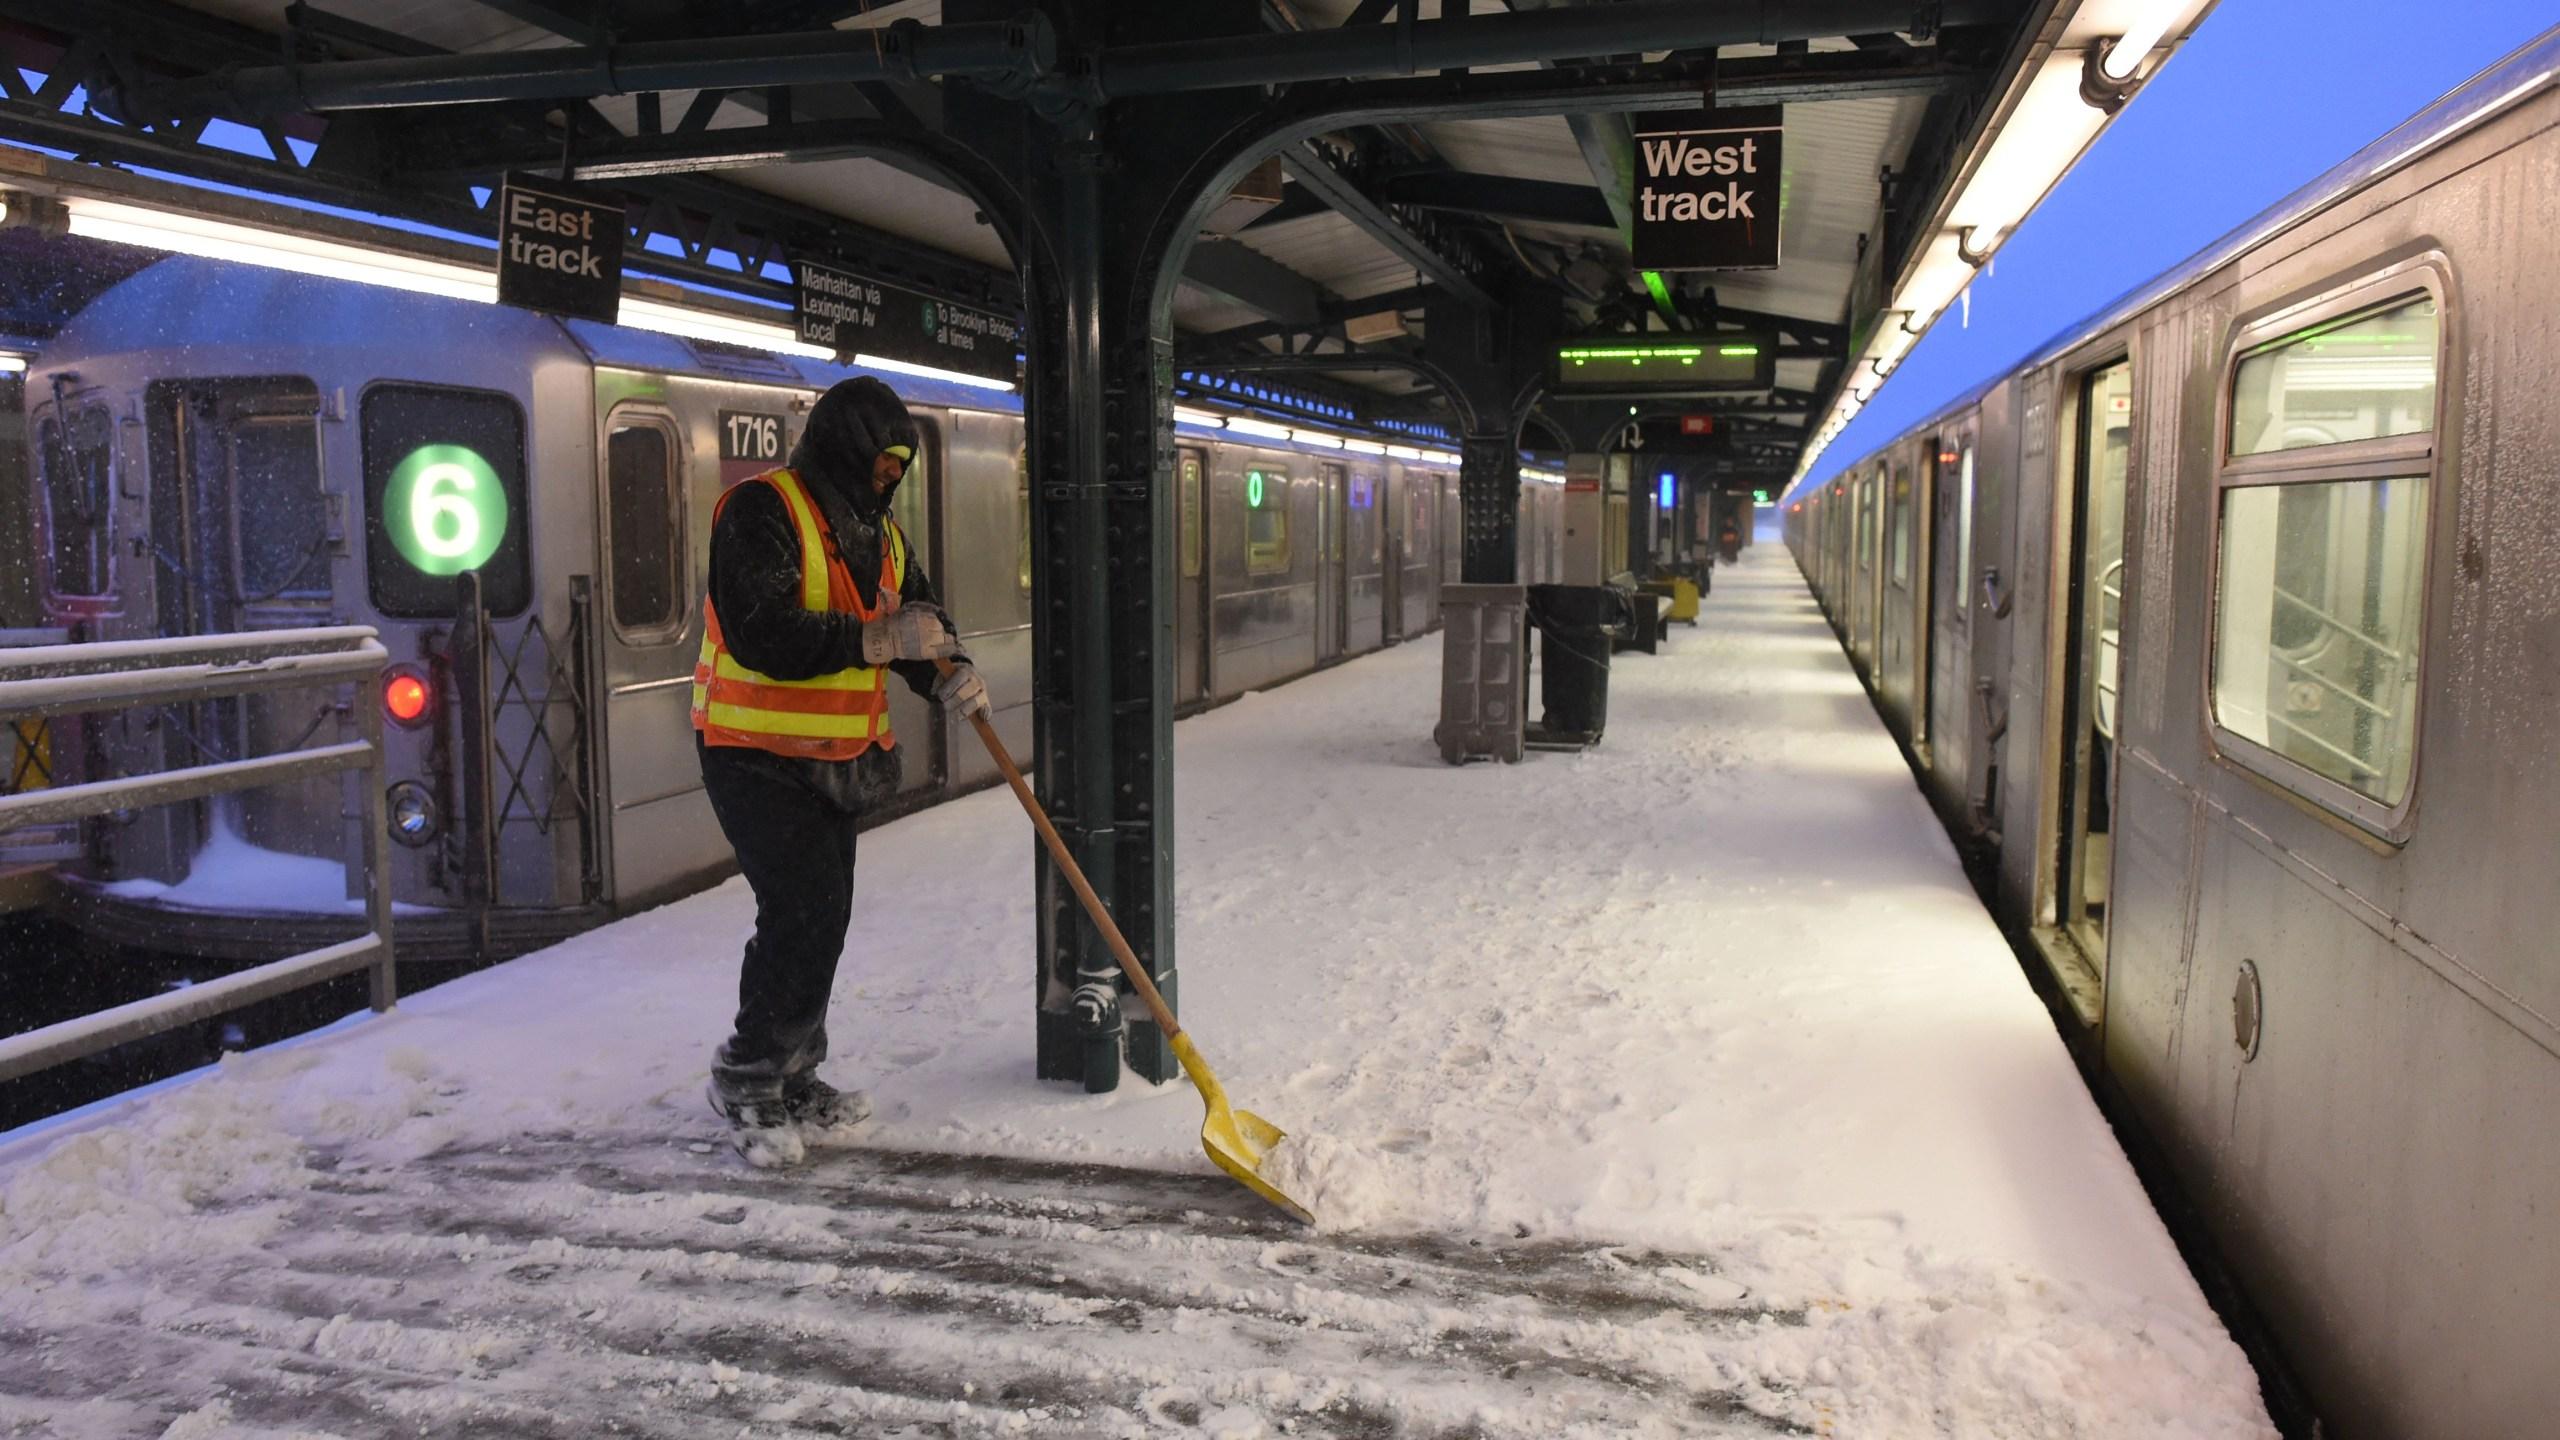 Snow on subway station platform